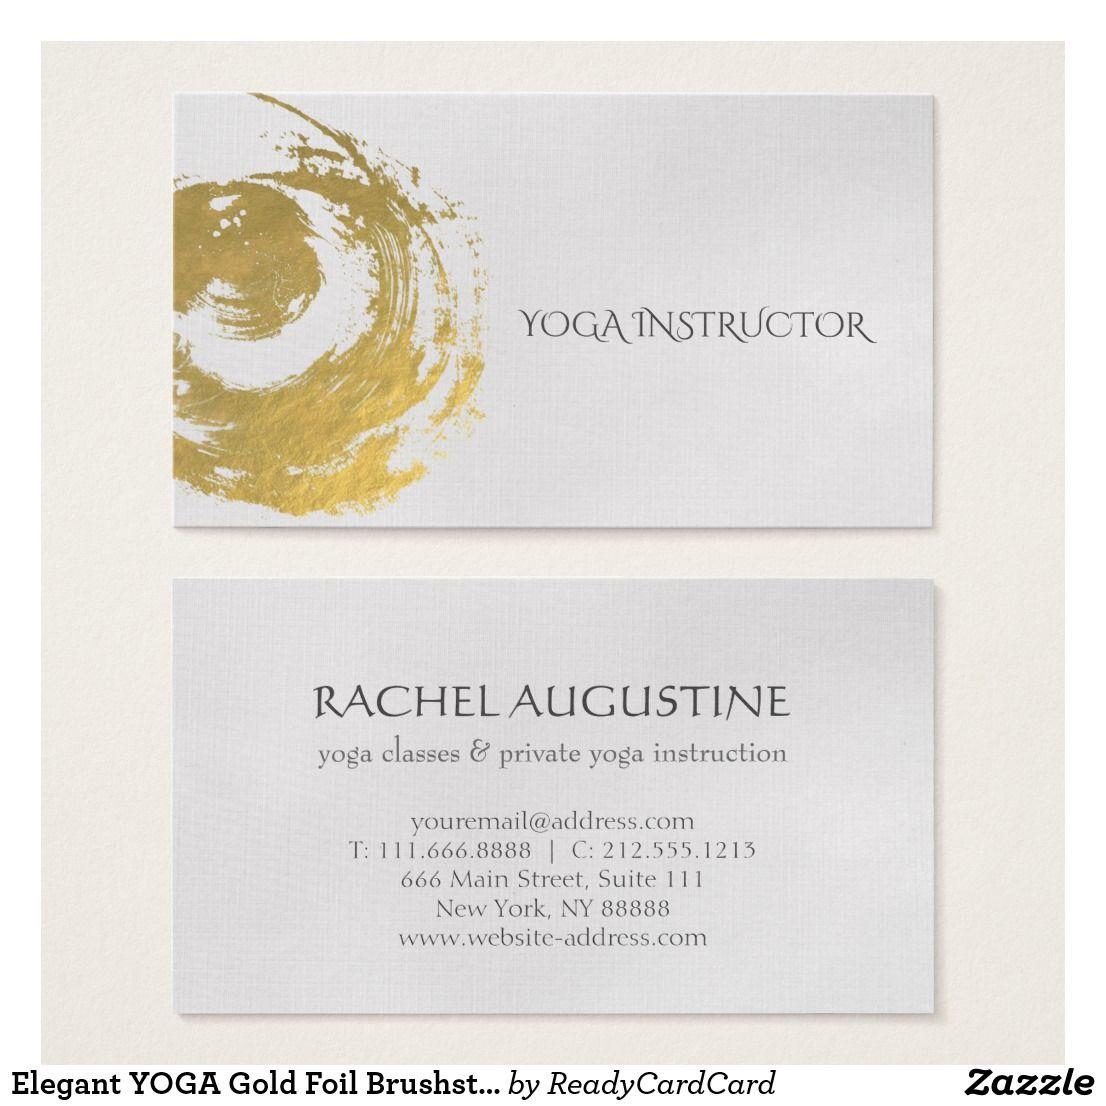 Elegant Yoga Gold Foil Brushstrokes Zen Symbol Business Card Zazzle Com Yoga Instructor Business Card Zen Symbol Yoga